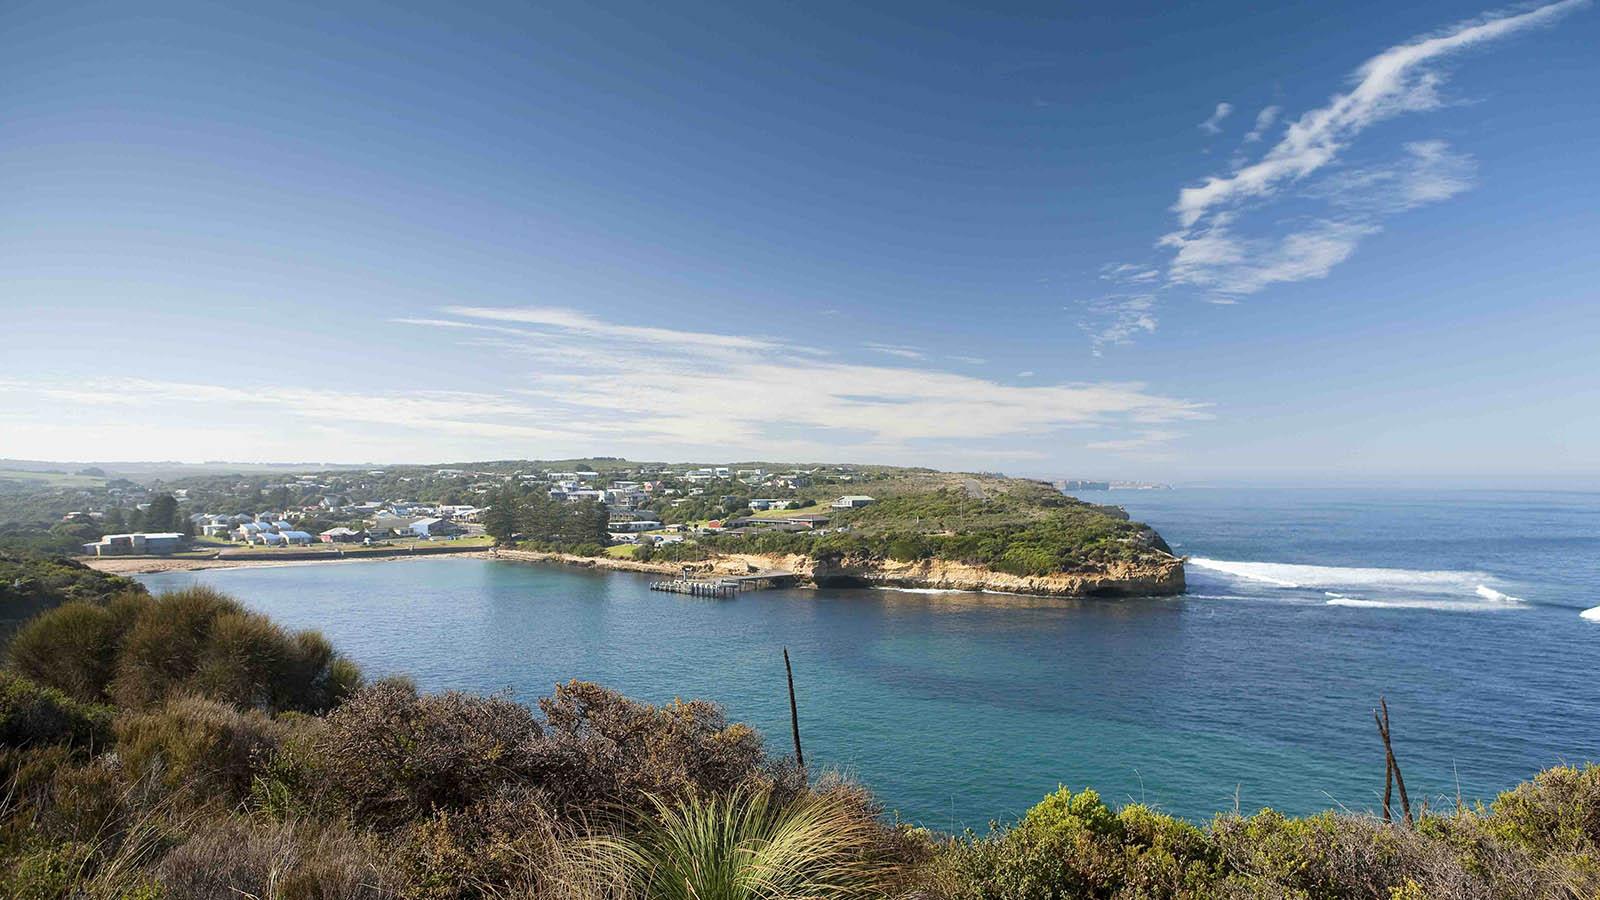 Port Campbell, The Great Ocean Road, Victoria, Australia